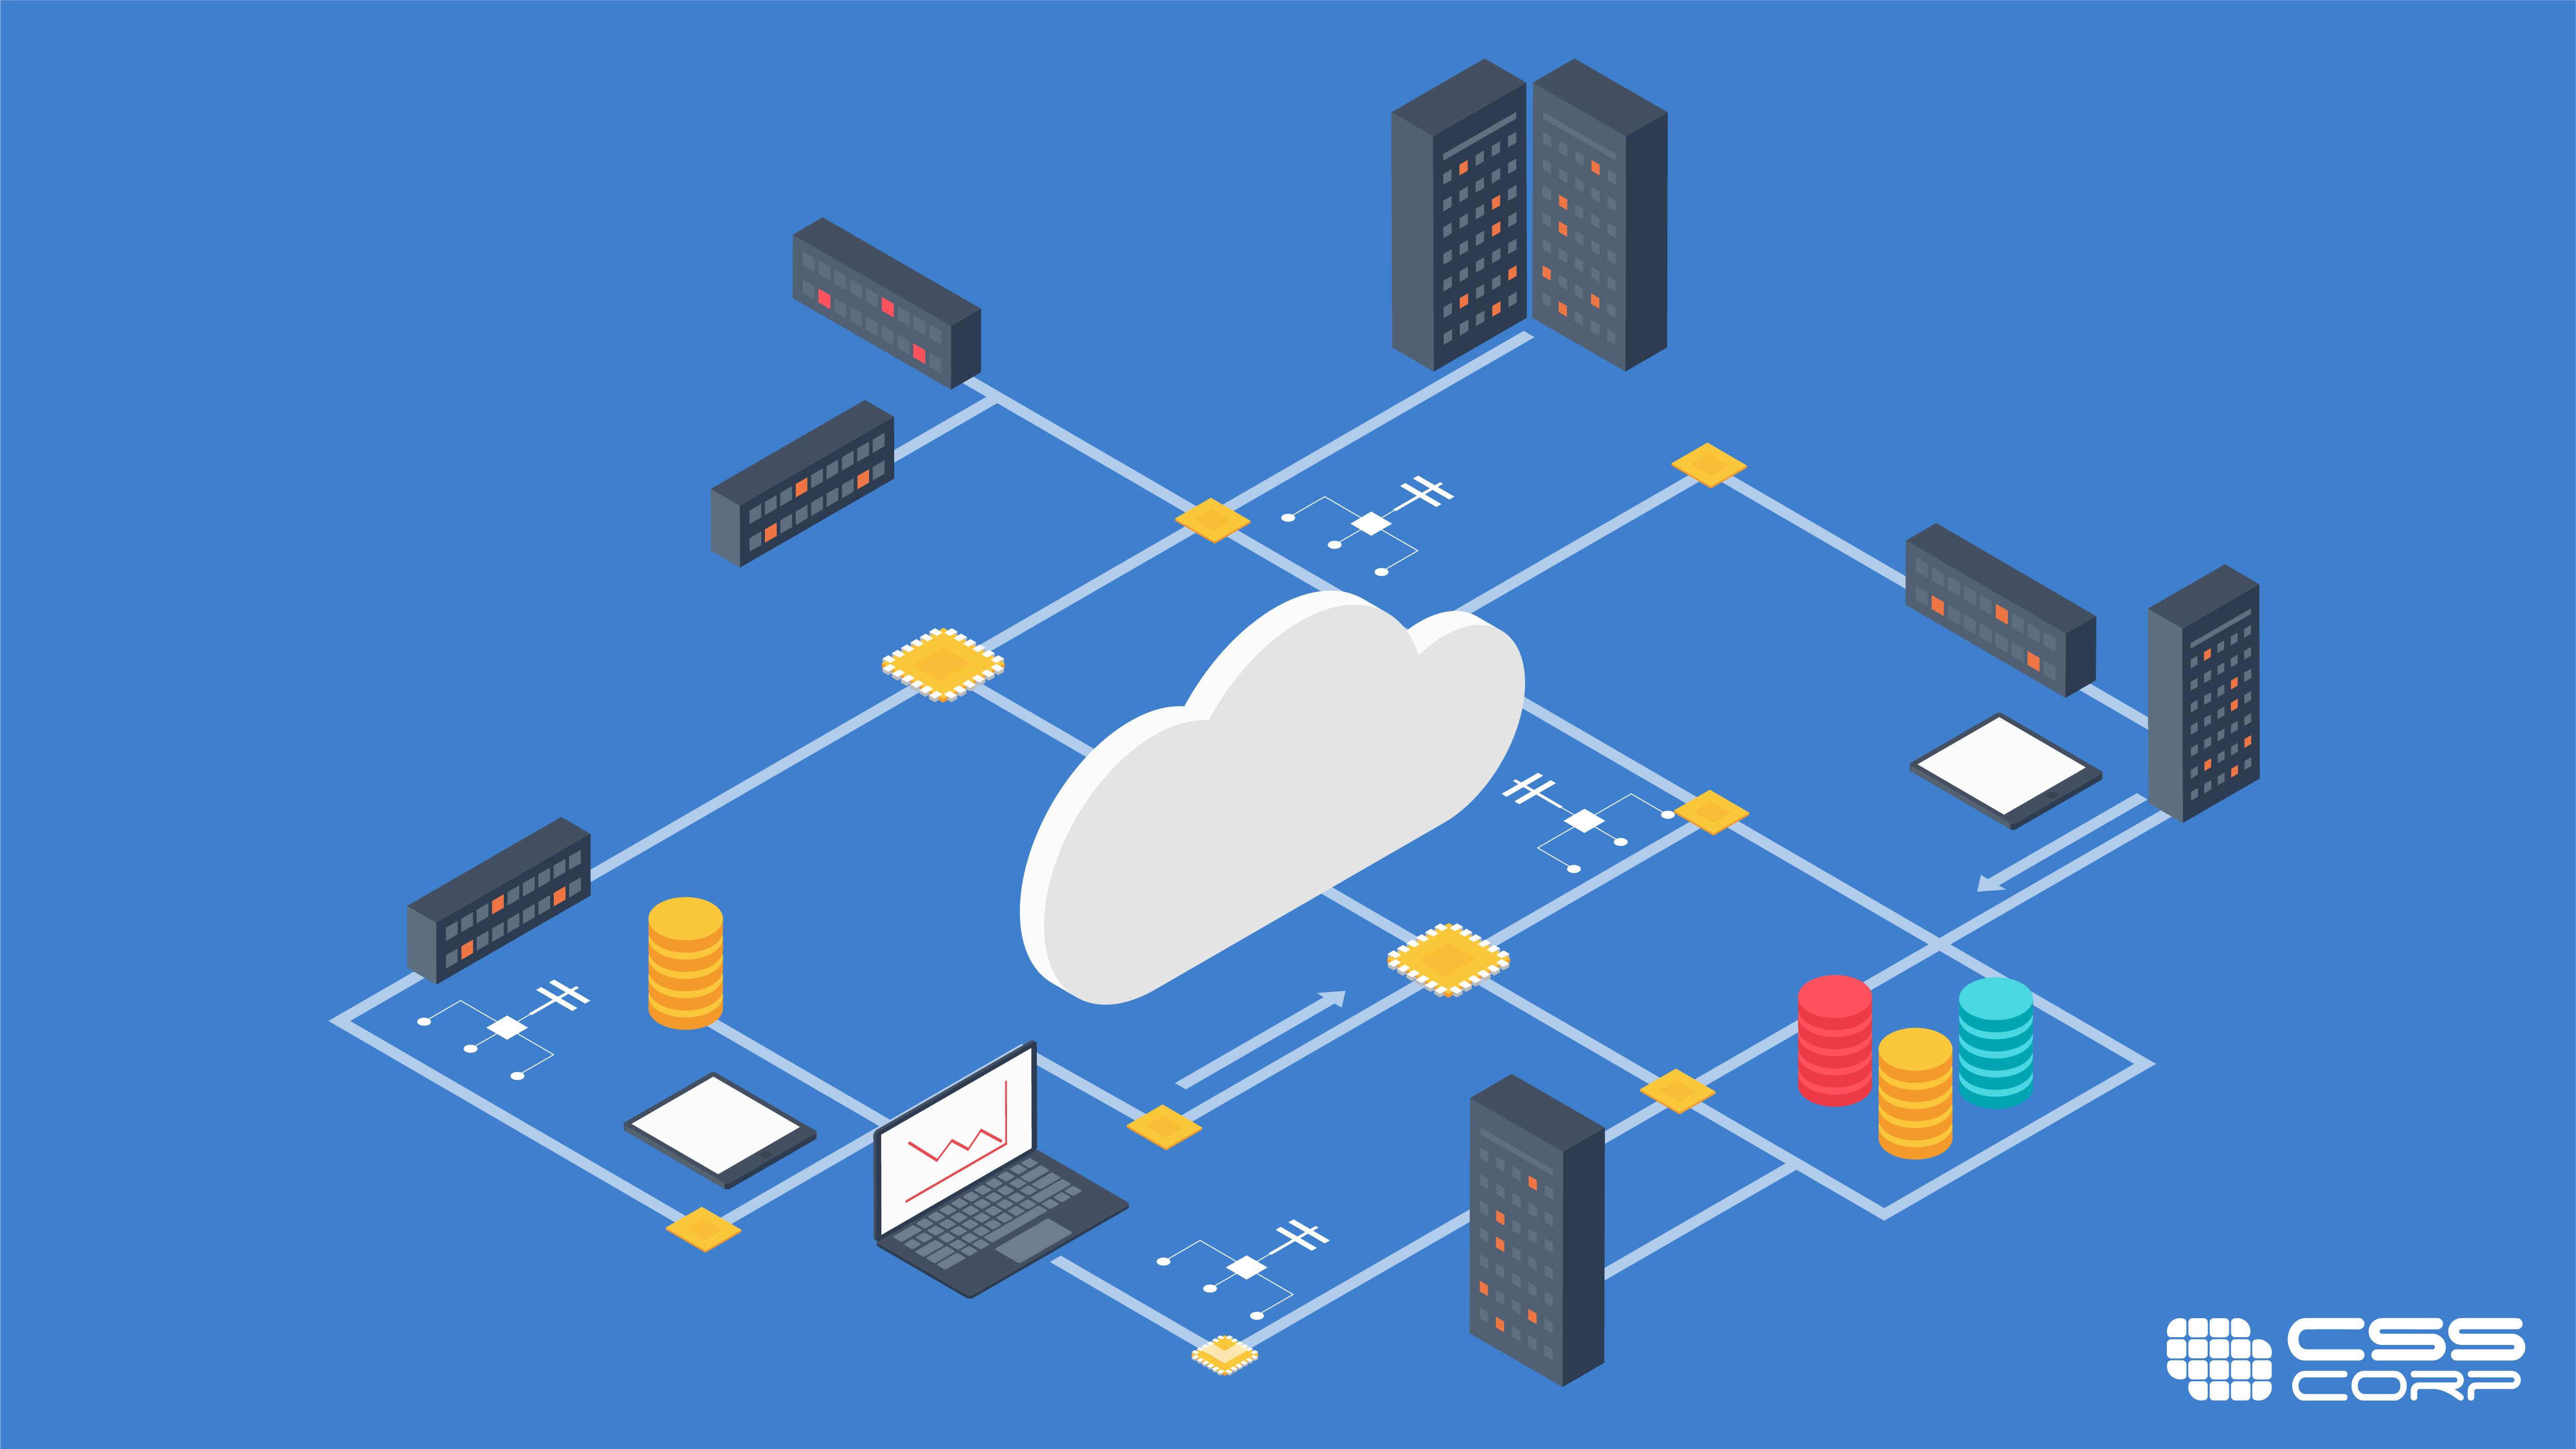 Cloud Deployment & Migration: A Guide for CIO's